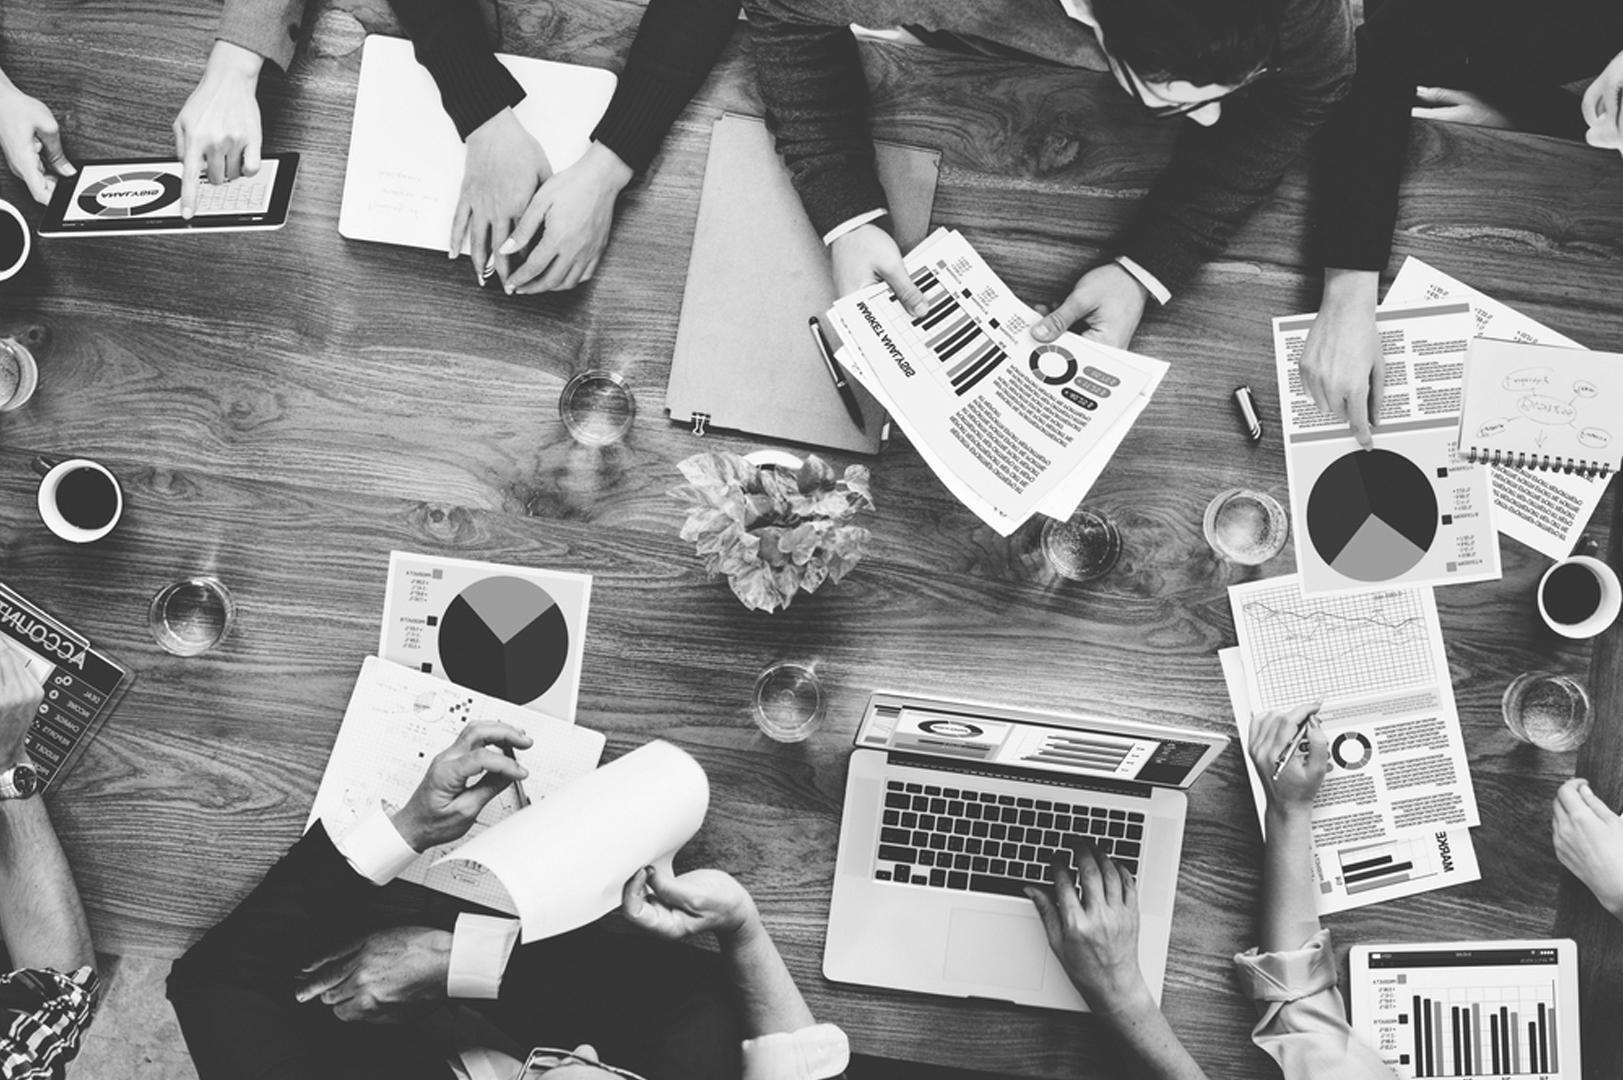 Oferta de empleo: Marketing Digital SEO/SEM